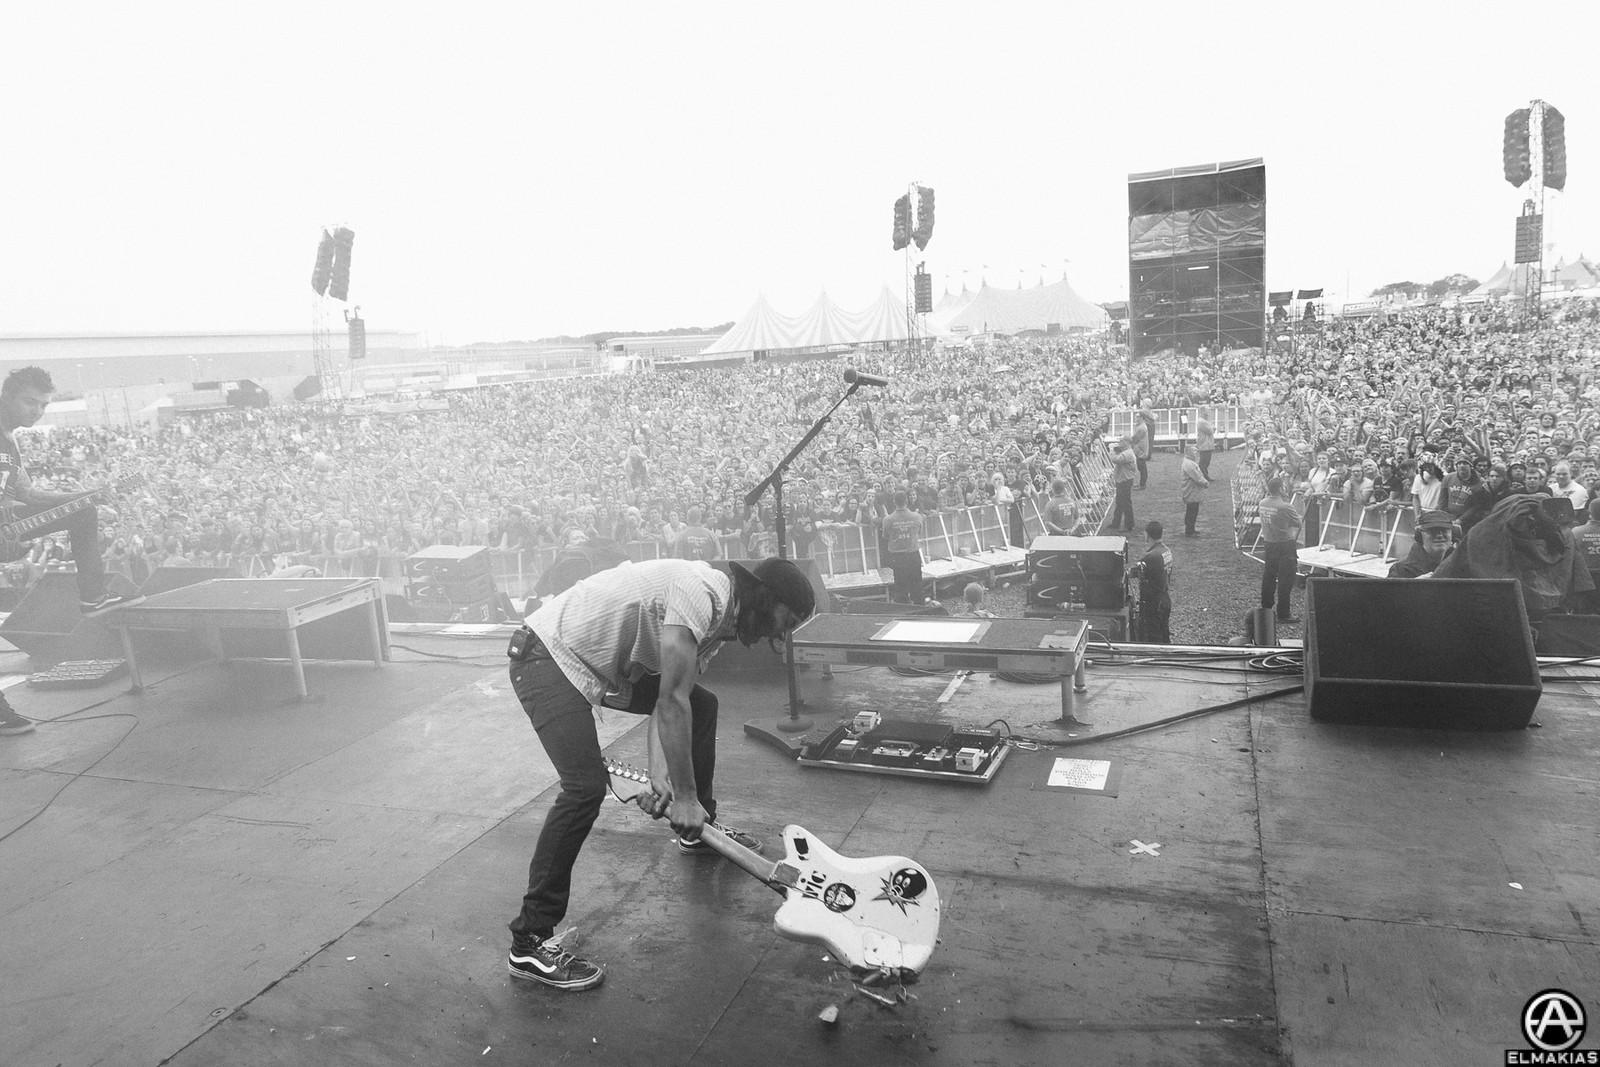 Pierce The Veil live at Reading Festival 2015 by Adam Elmakias